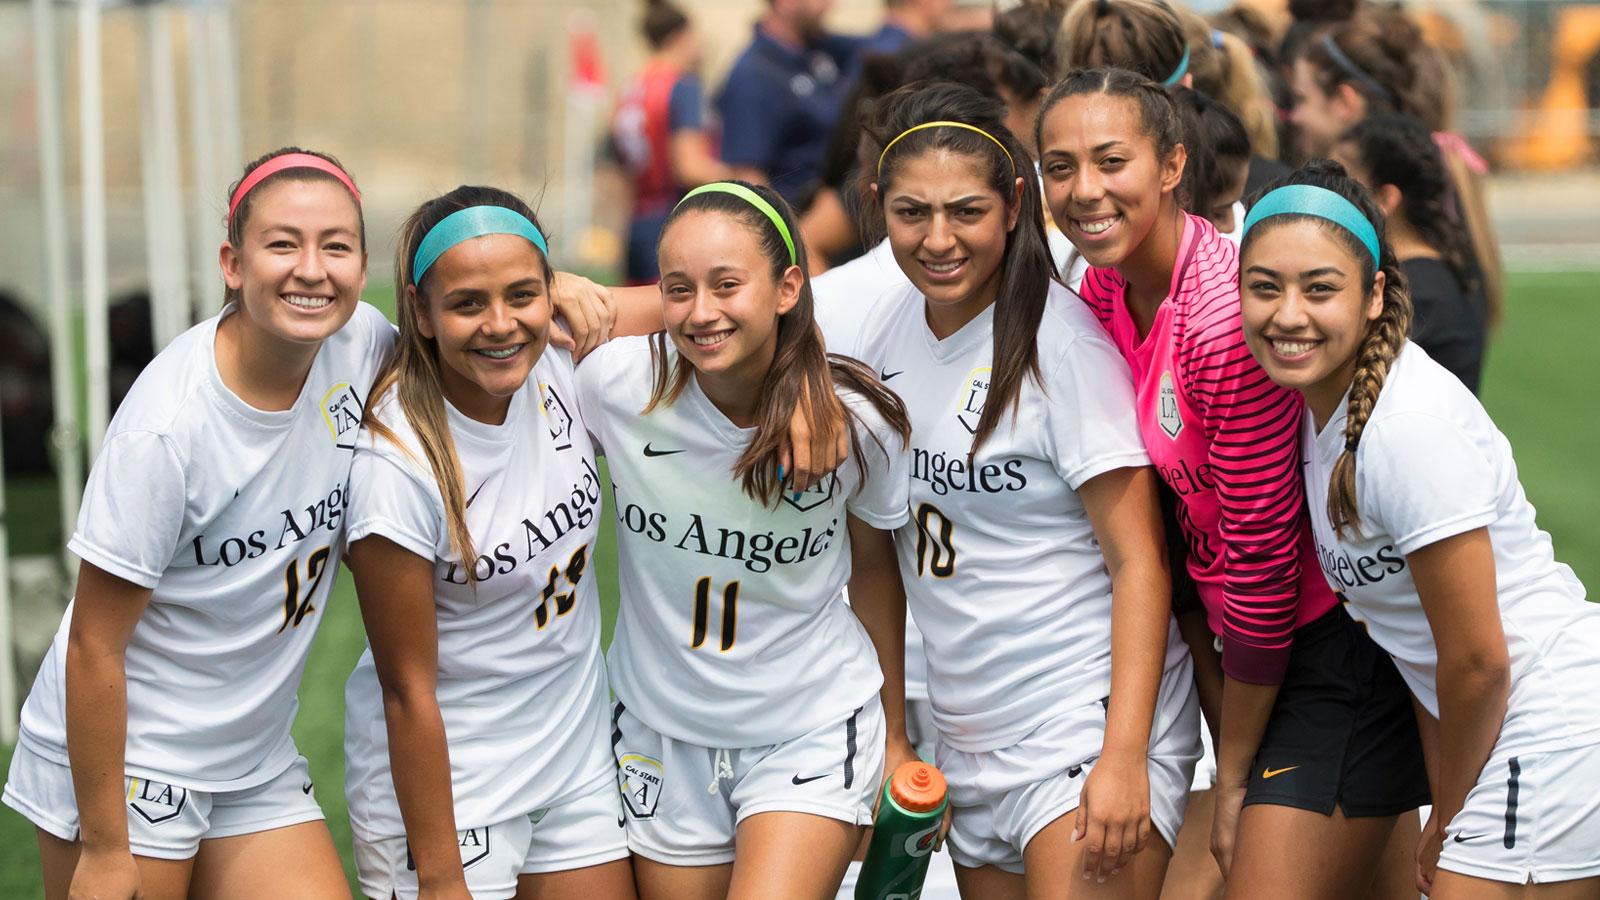 Paulina Chaidez poses for the camera with Erika Lizarraga, Meranda Salazar, Zarette Munoz-Aguilar, Adriana Maldonado, and Valerie Mares.